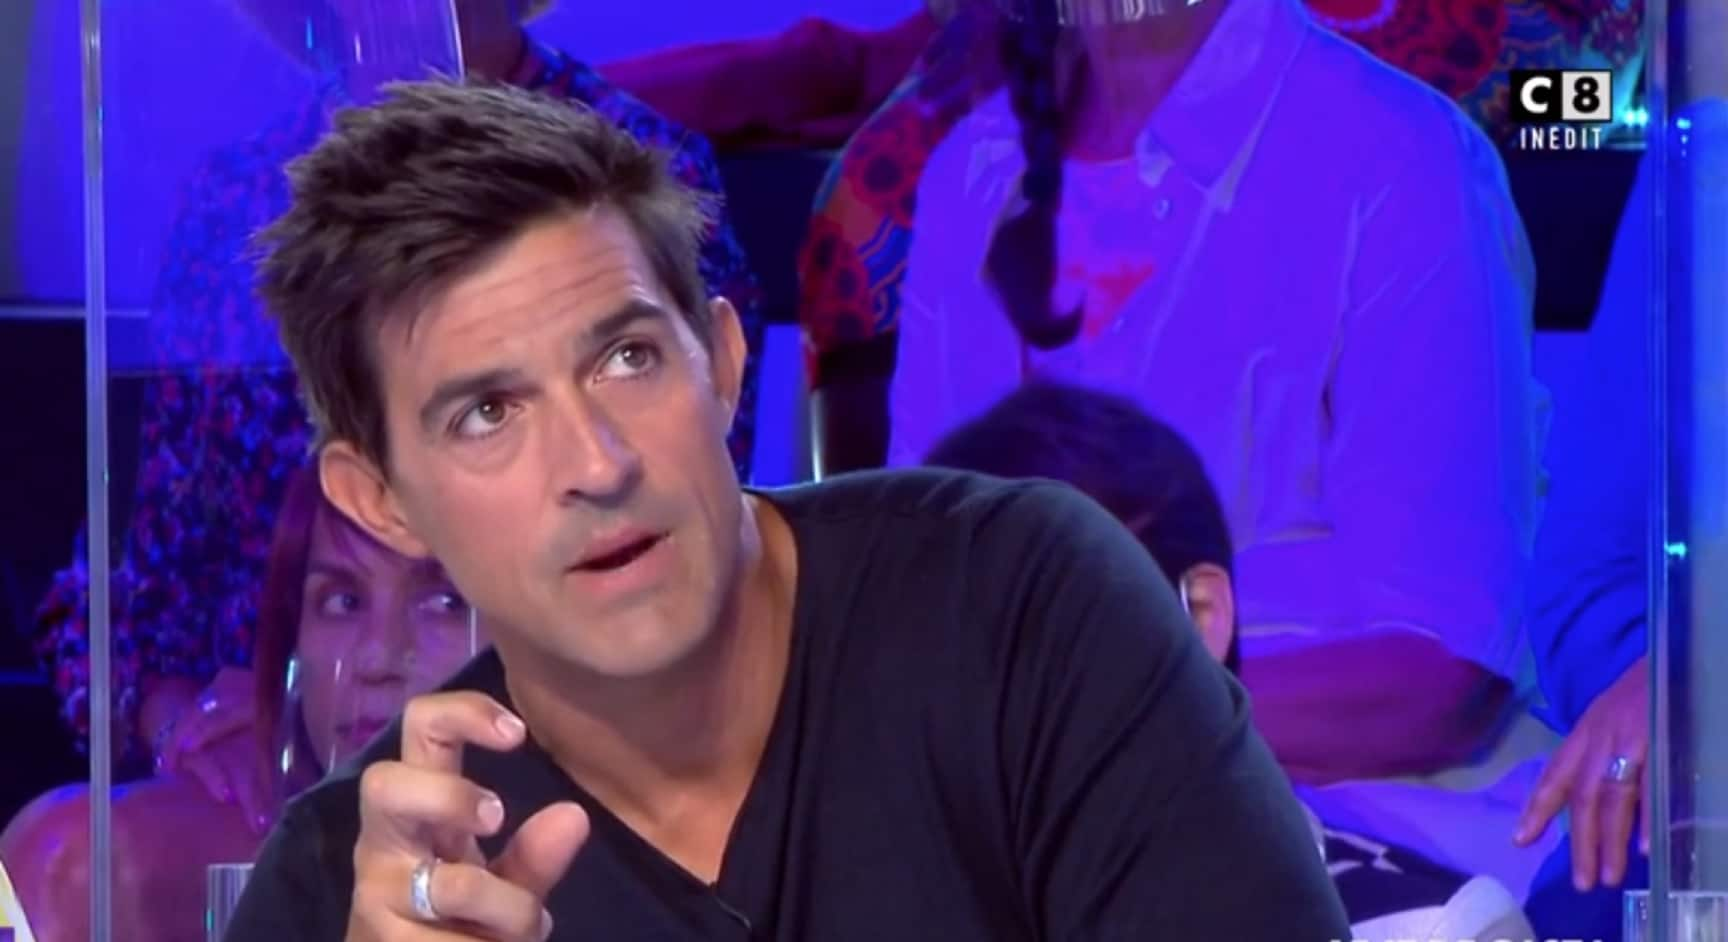 Jean-Pascal Lacoste